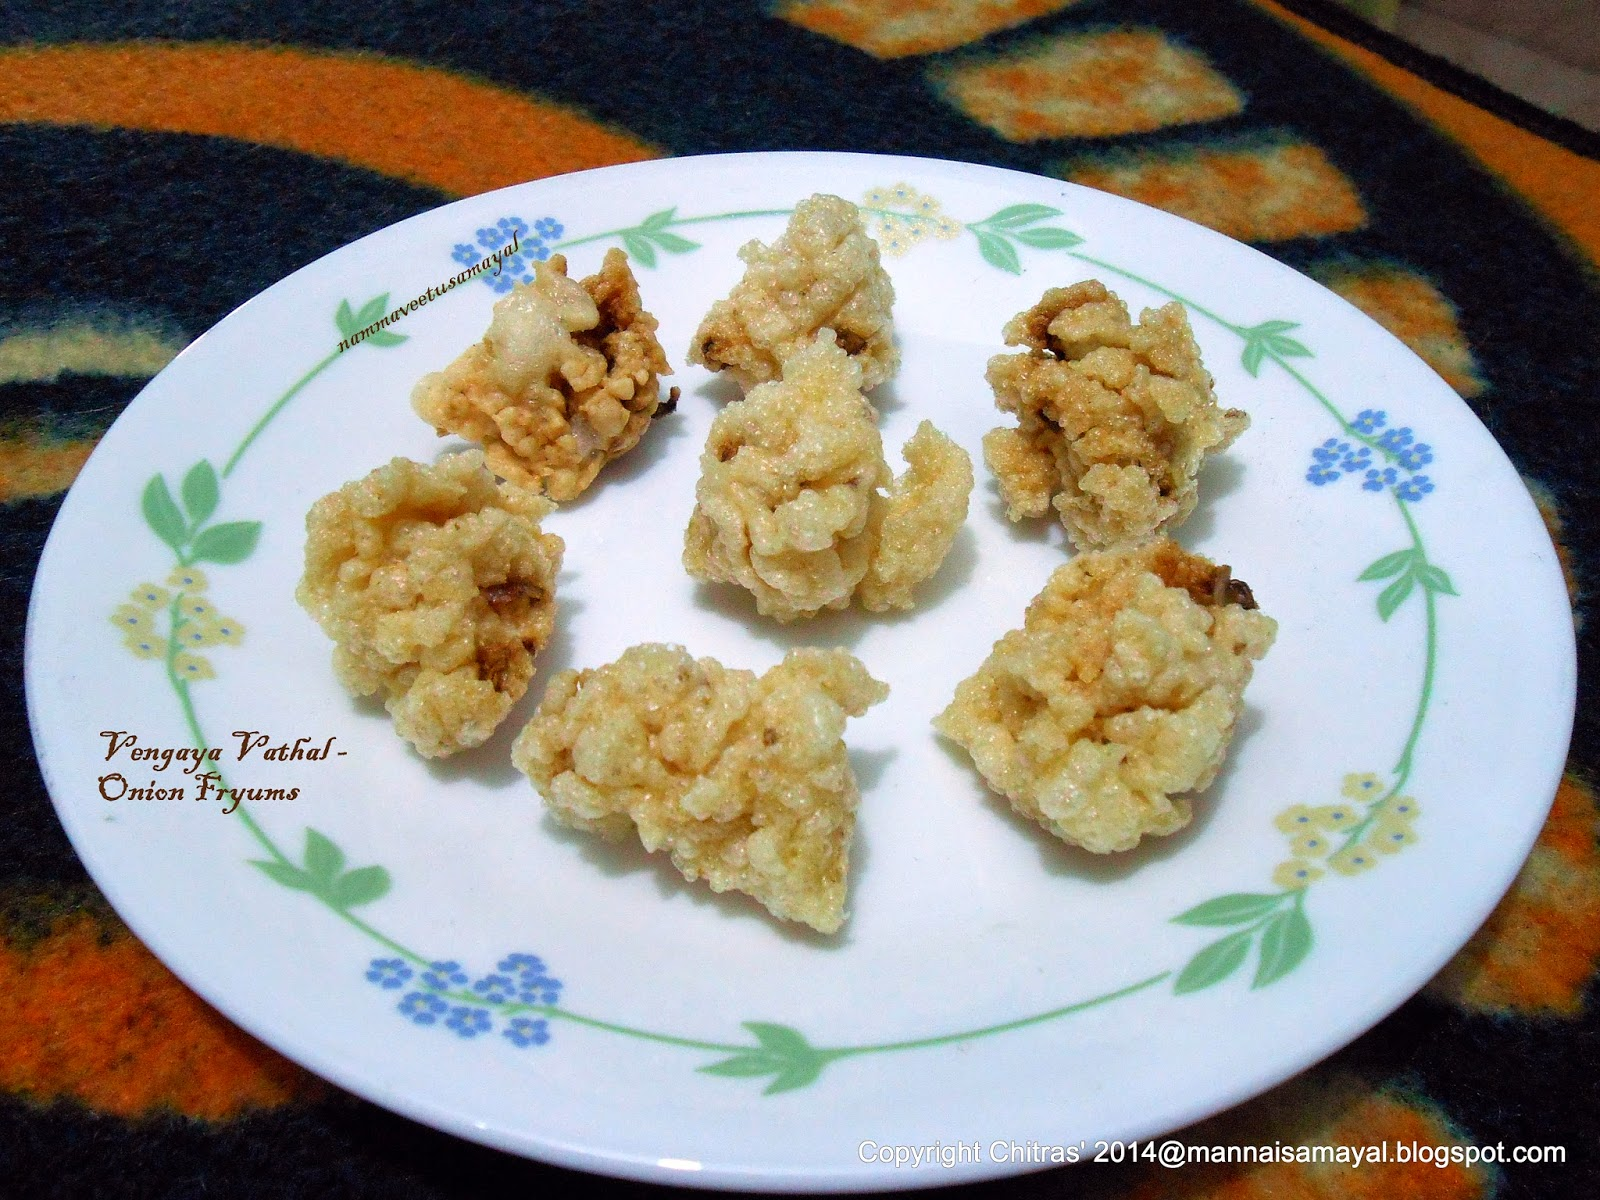 Vengaya Vathal [ Onion Fryums ]